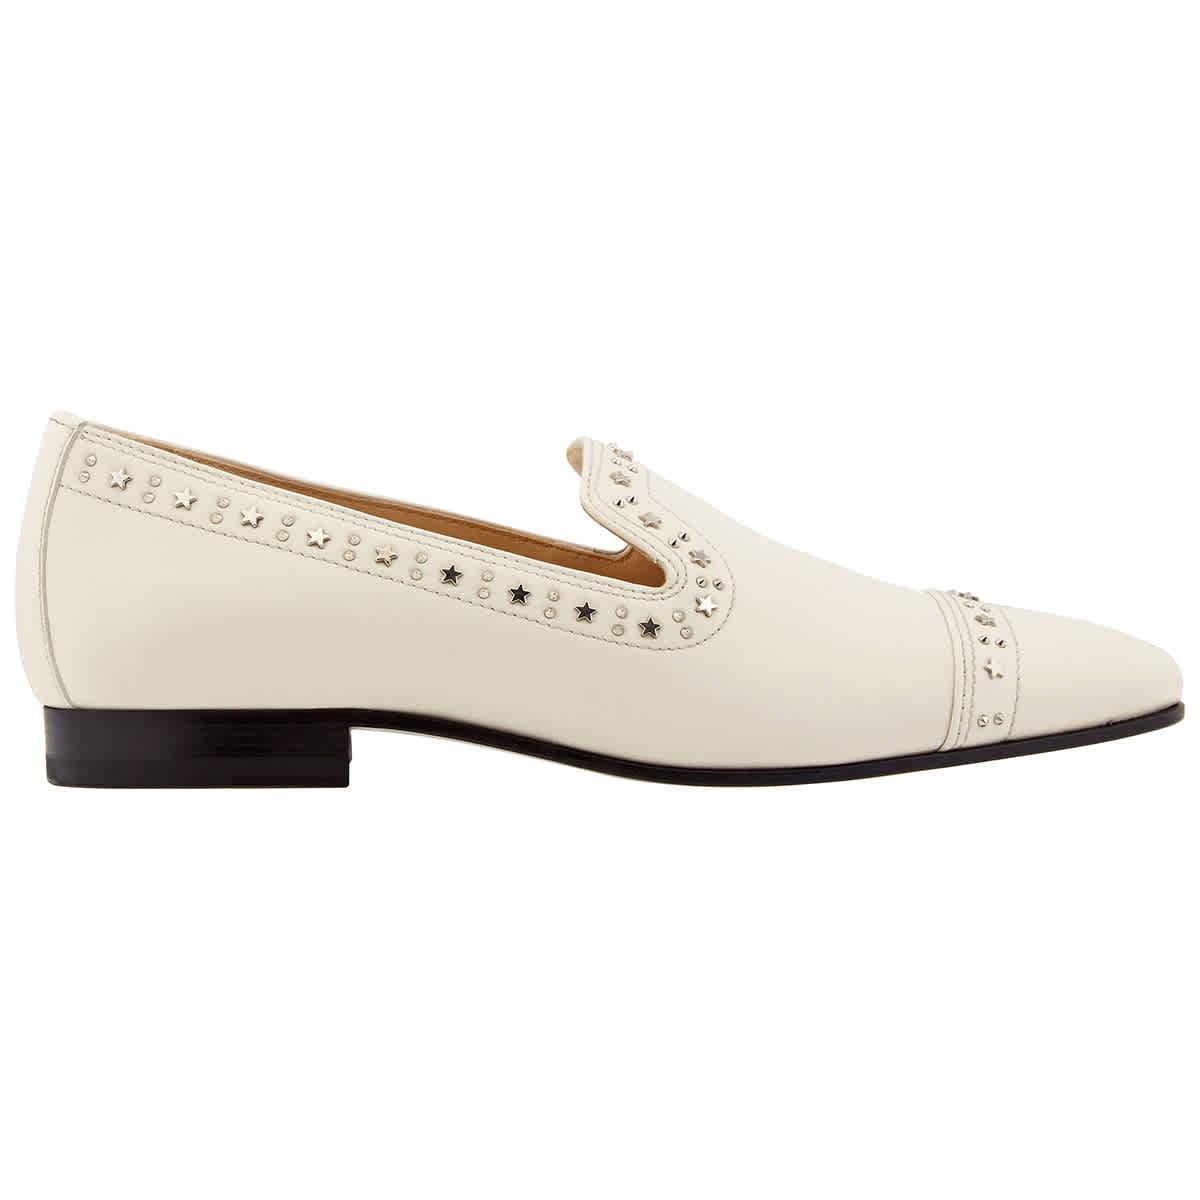 Jimmy Choo Ladies Saunda Star Studded Loafers In N,a